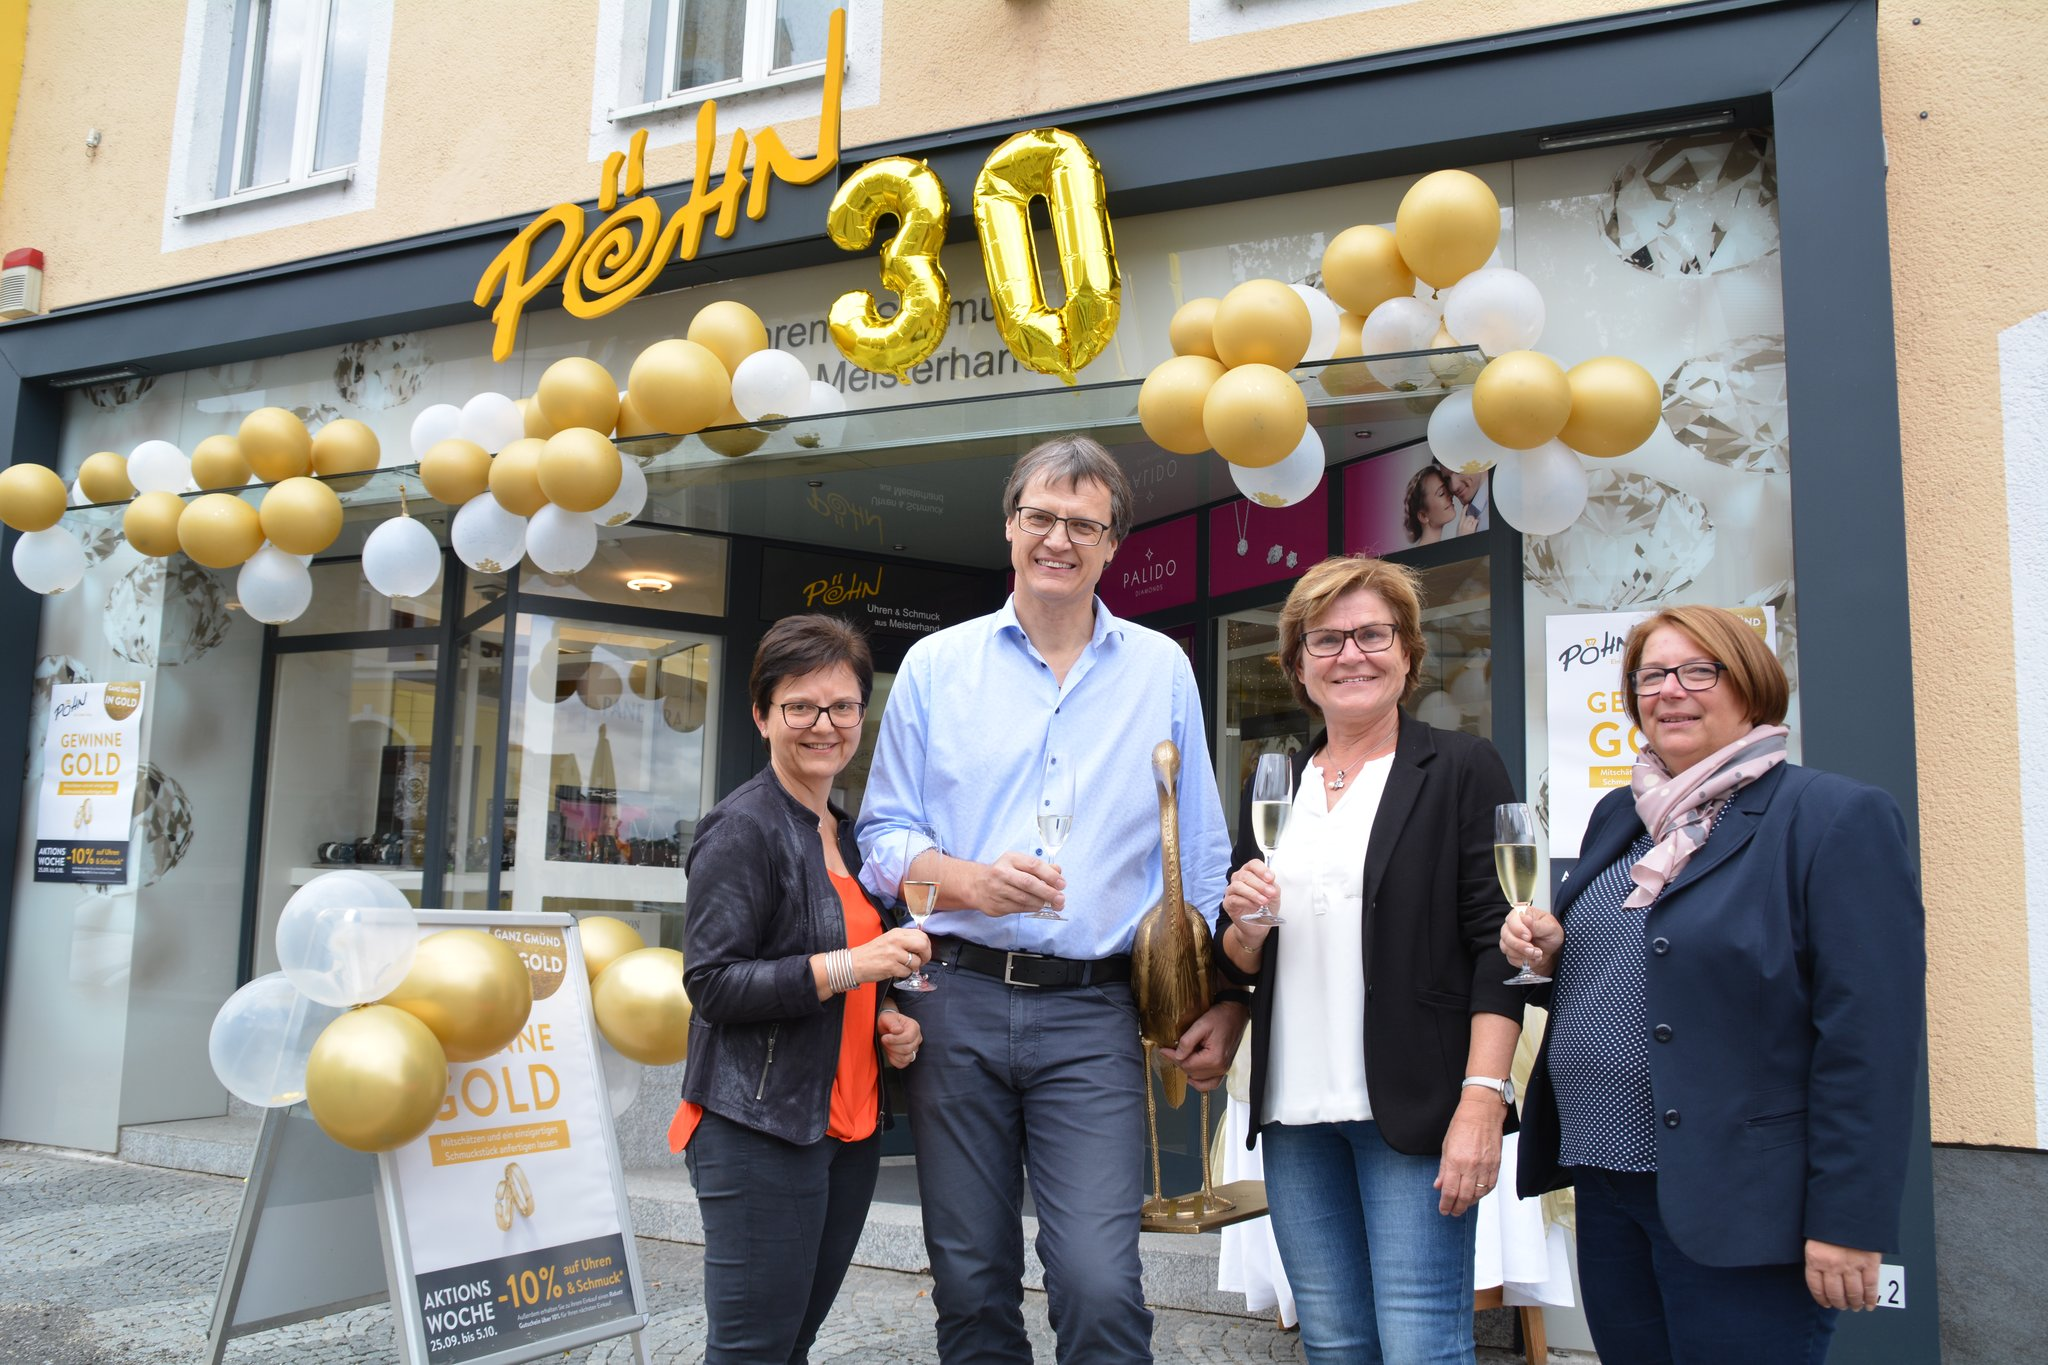 Zwettl Partnersuche Gmnd in Krnten - Bi Mann Sucht Mann